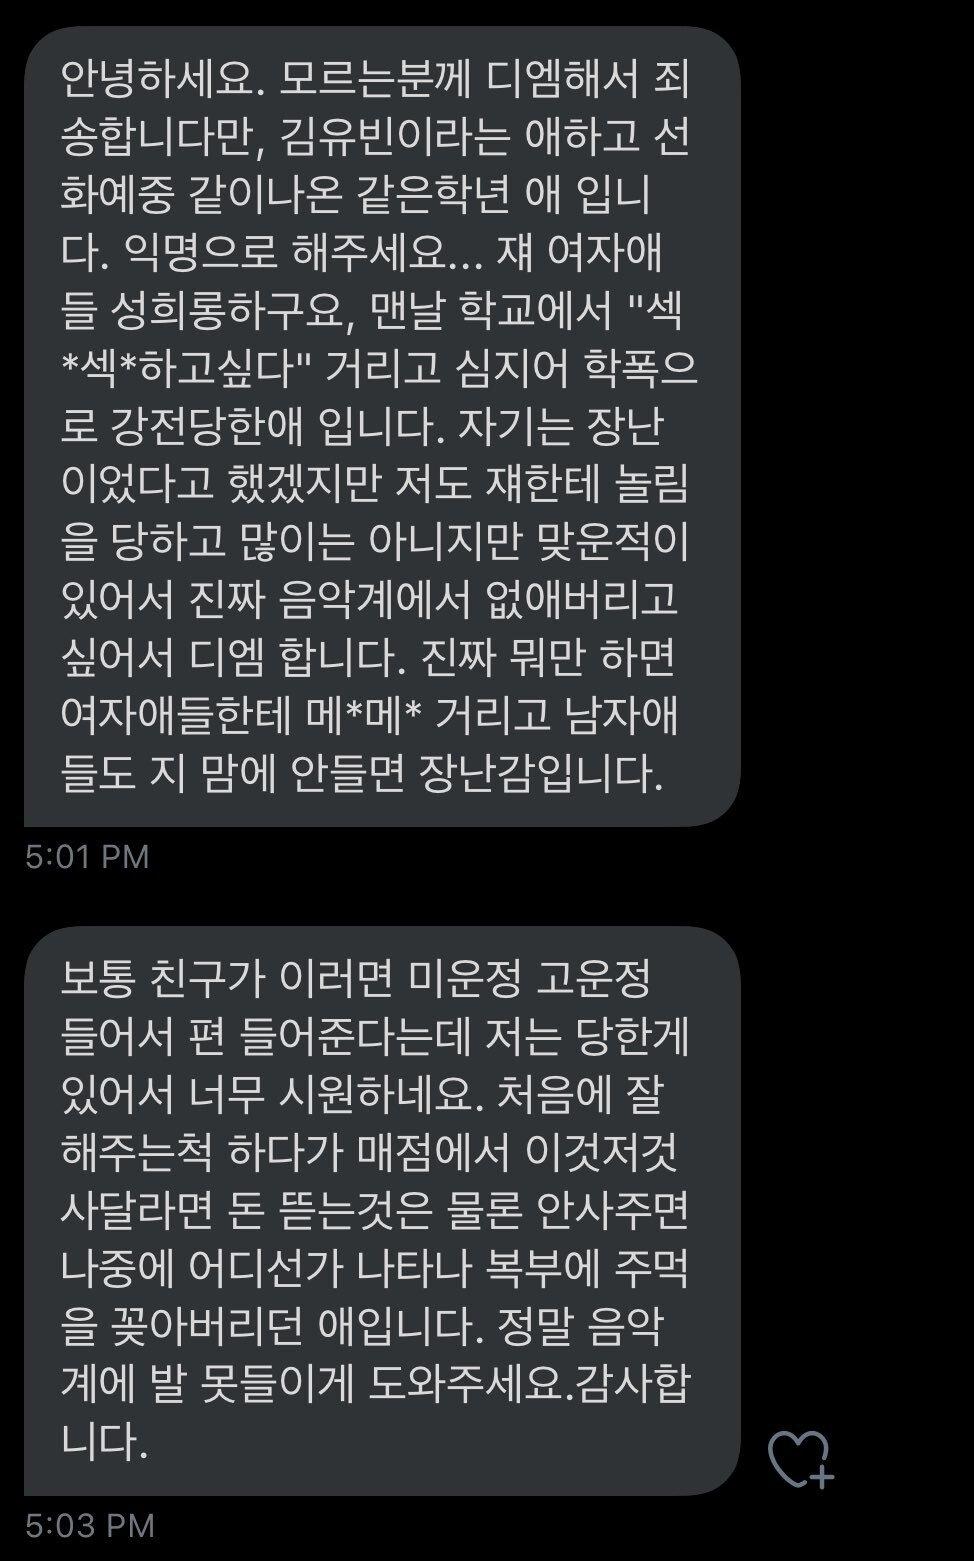 ET8SS_GUYAAOdFw.jpg 김유빈 죽이기 시작한 그 분들.jpg